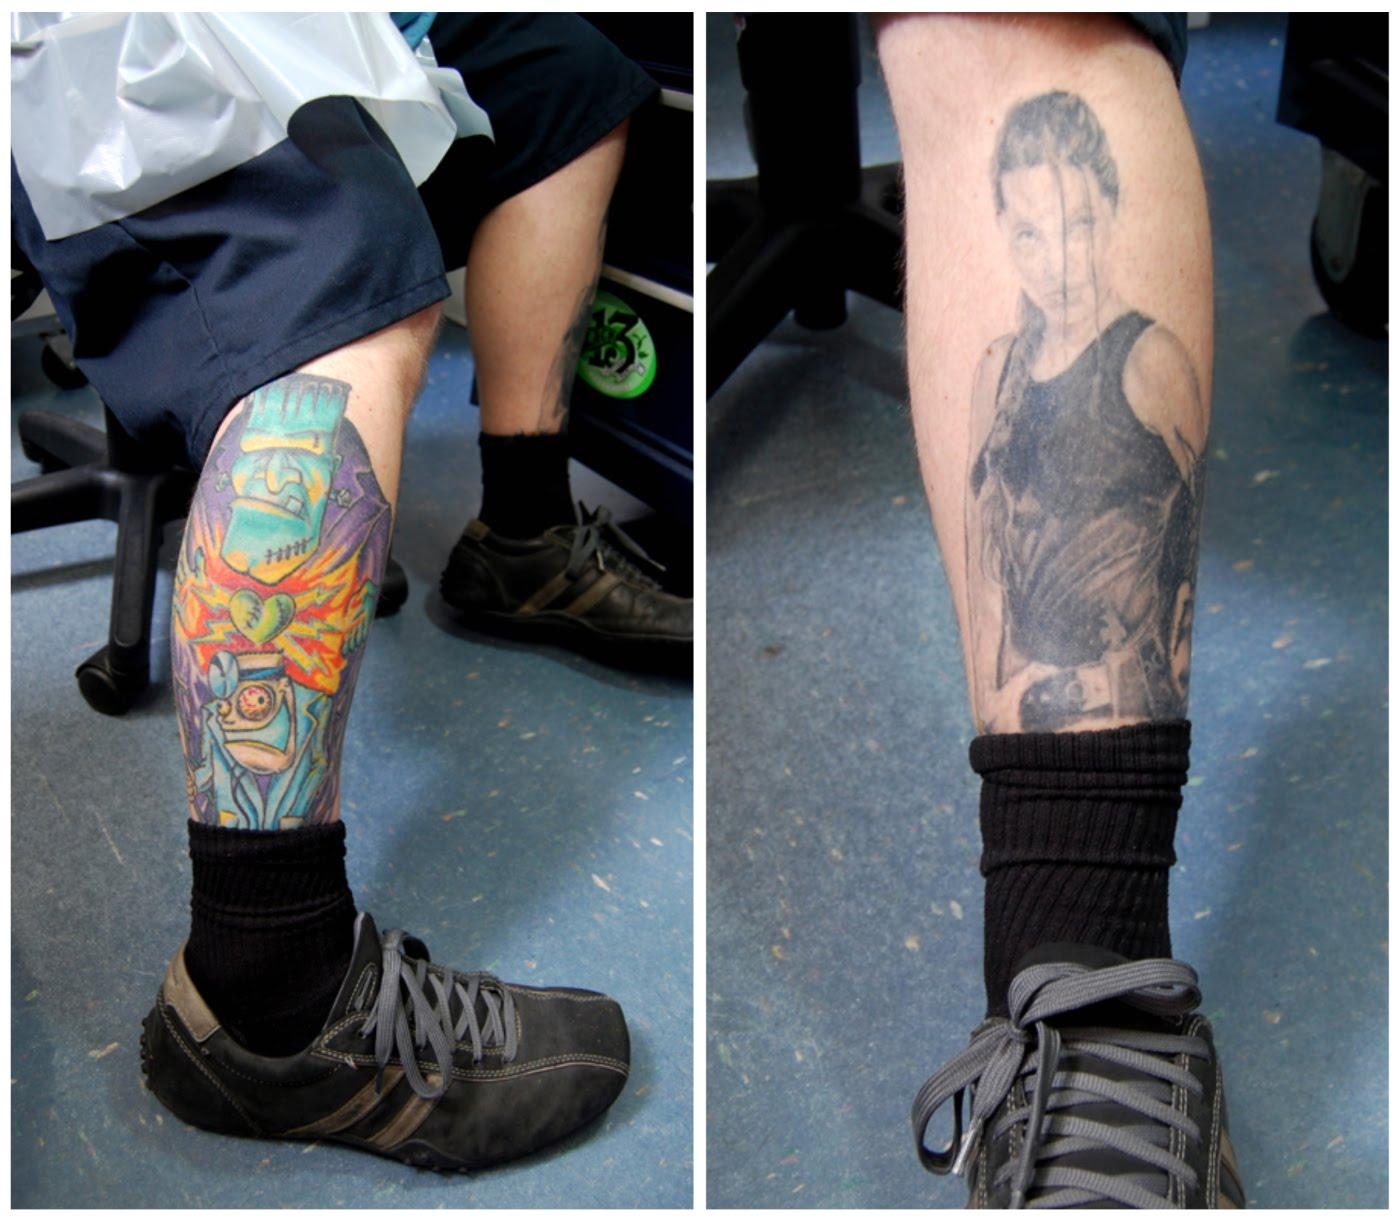 Fournitures de tatouage Tatouage Equipement Machines  - Matériel Tatouage Professionnel